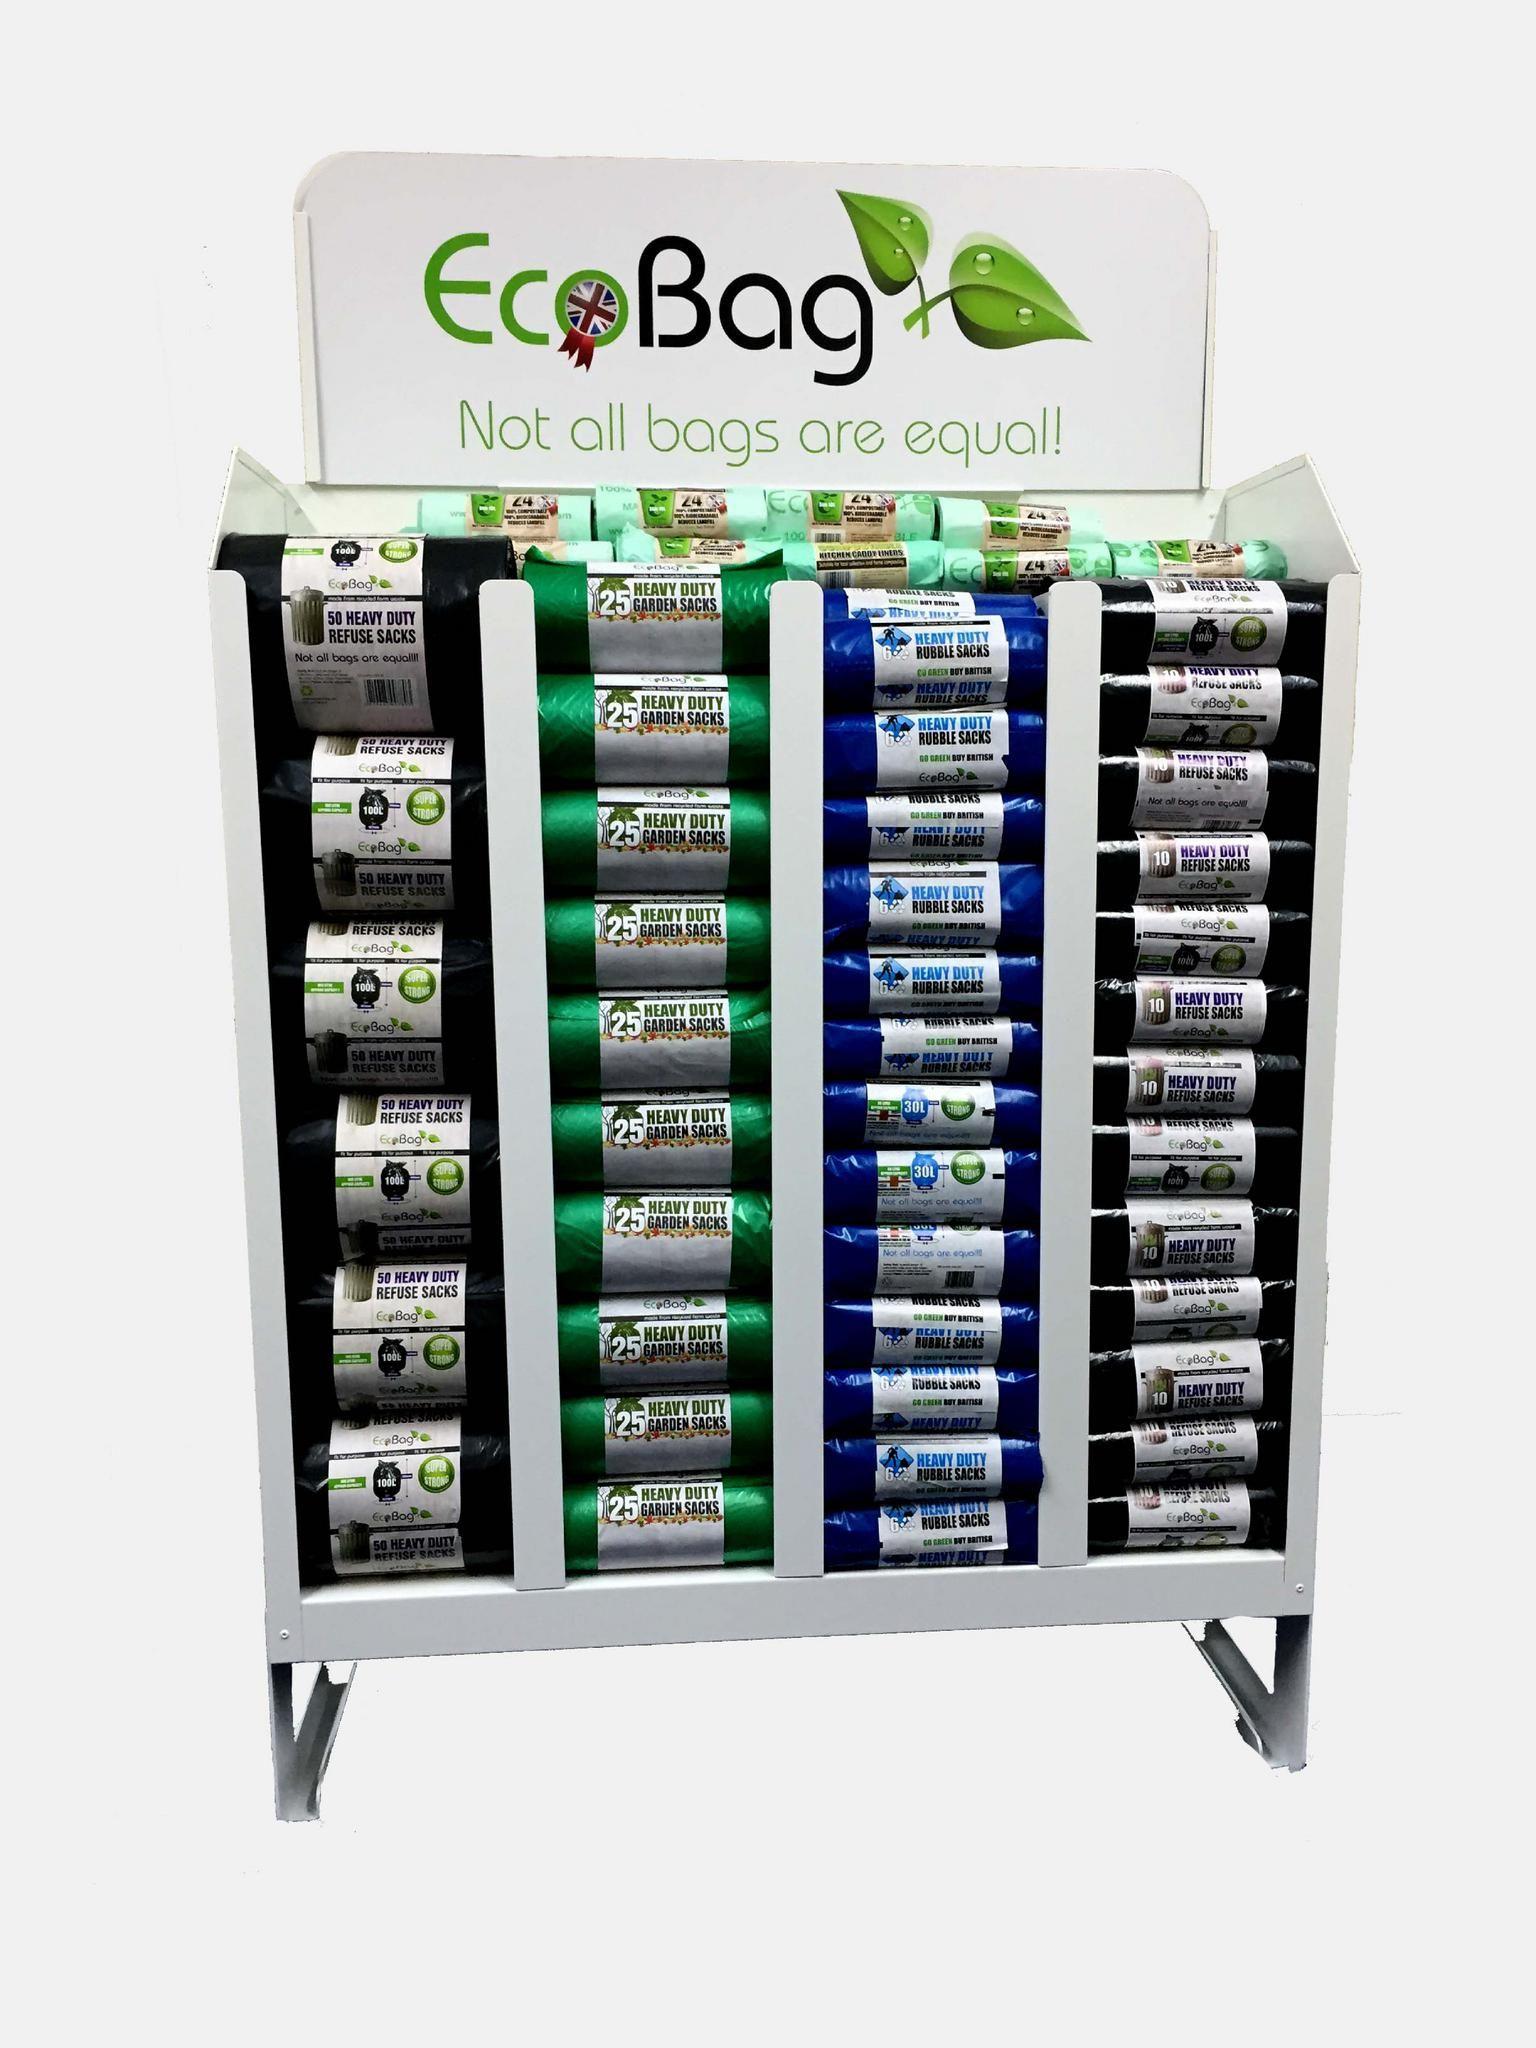 Economy Bag Company